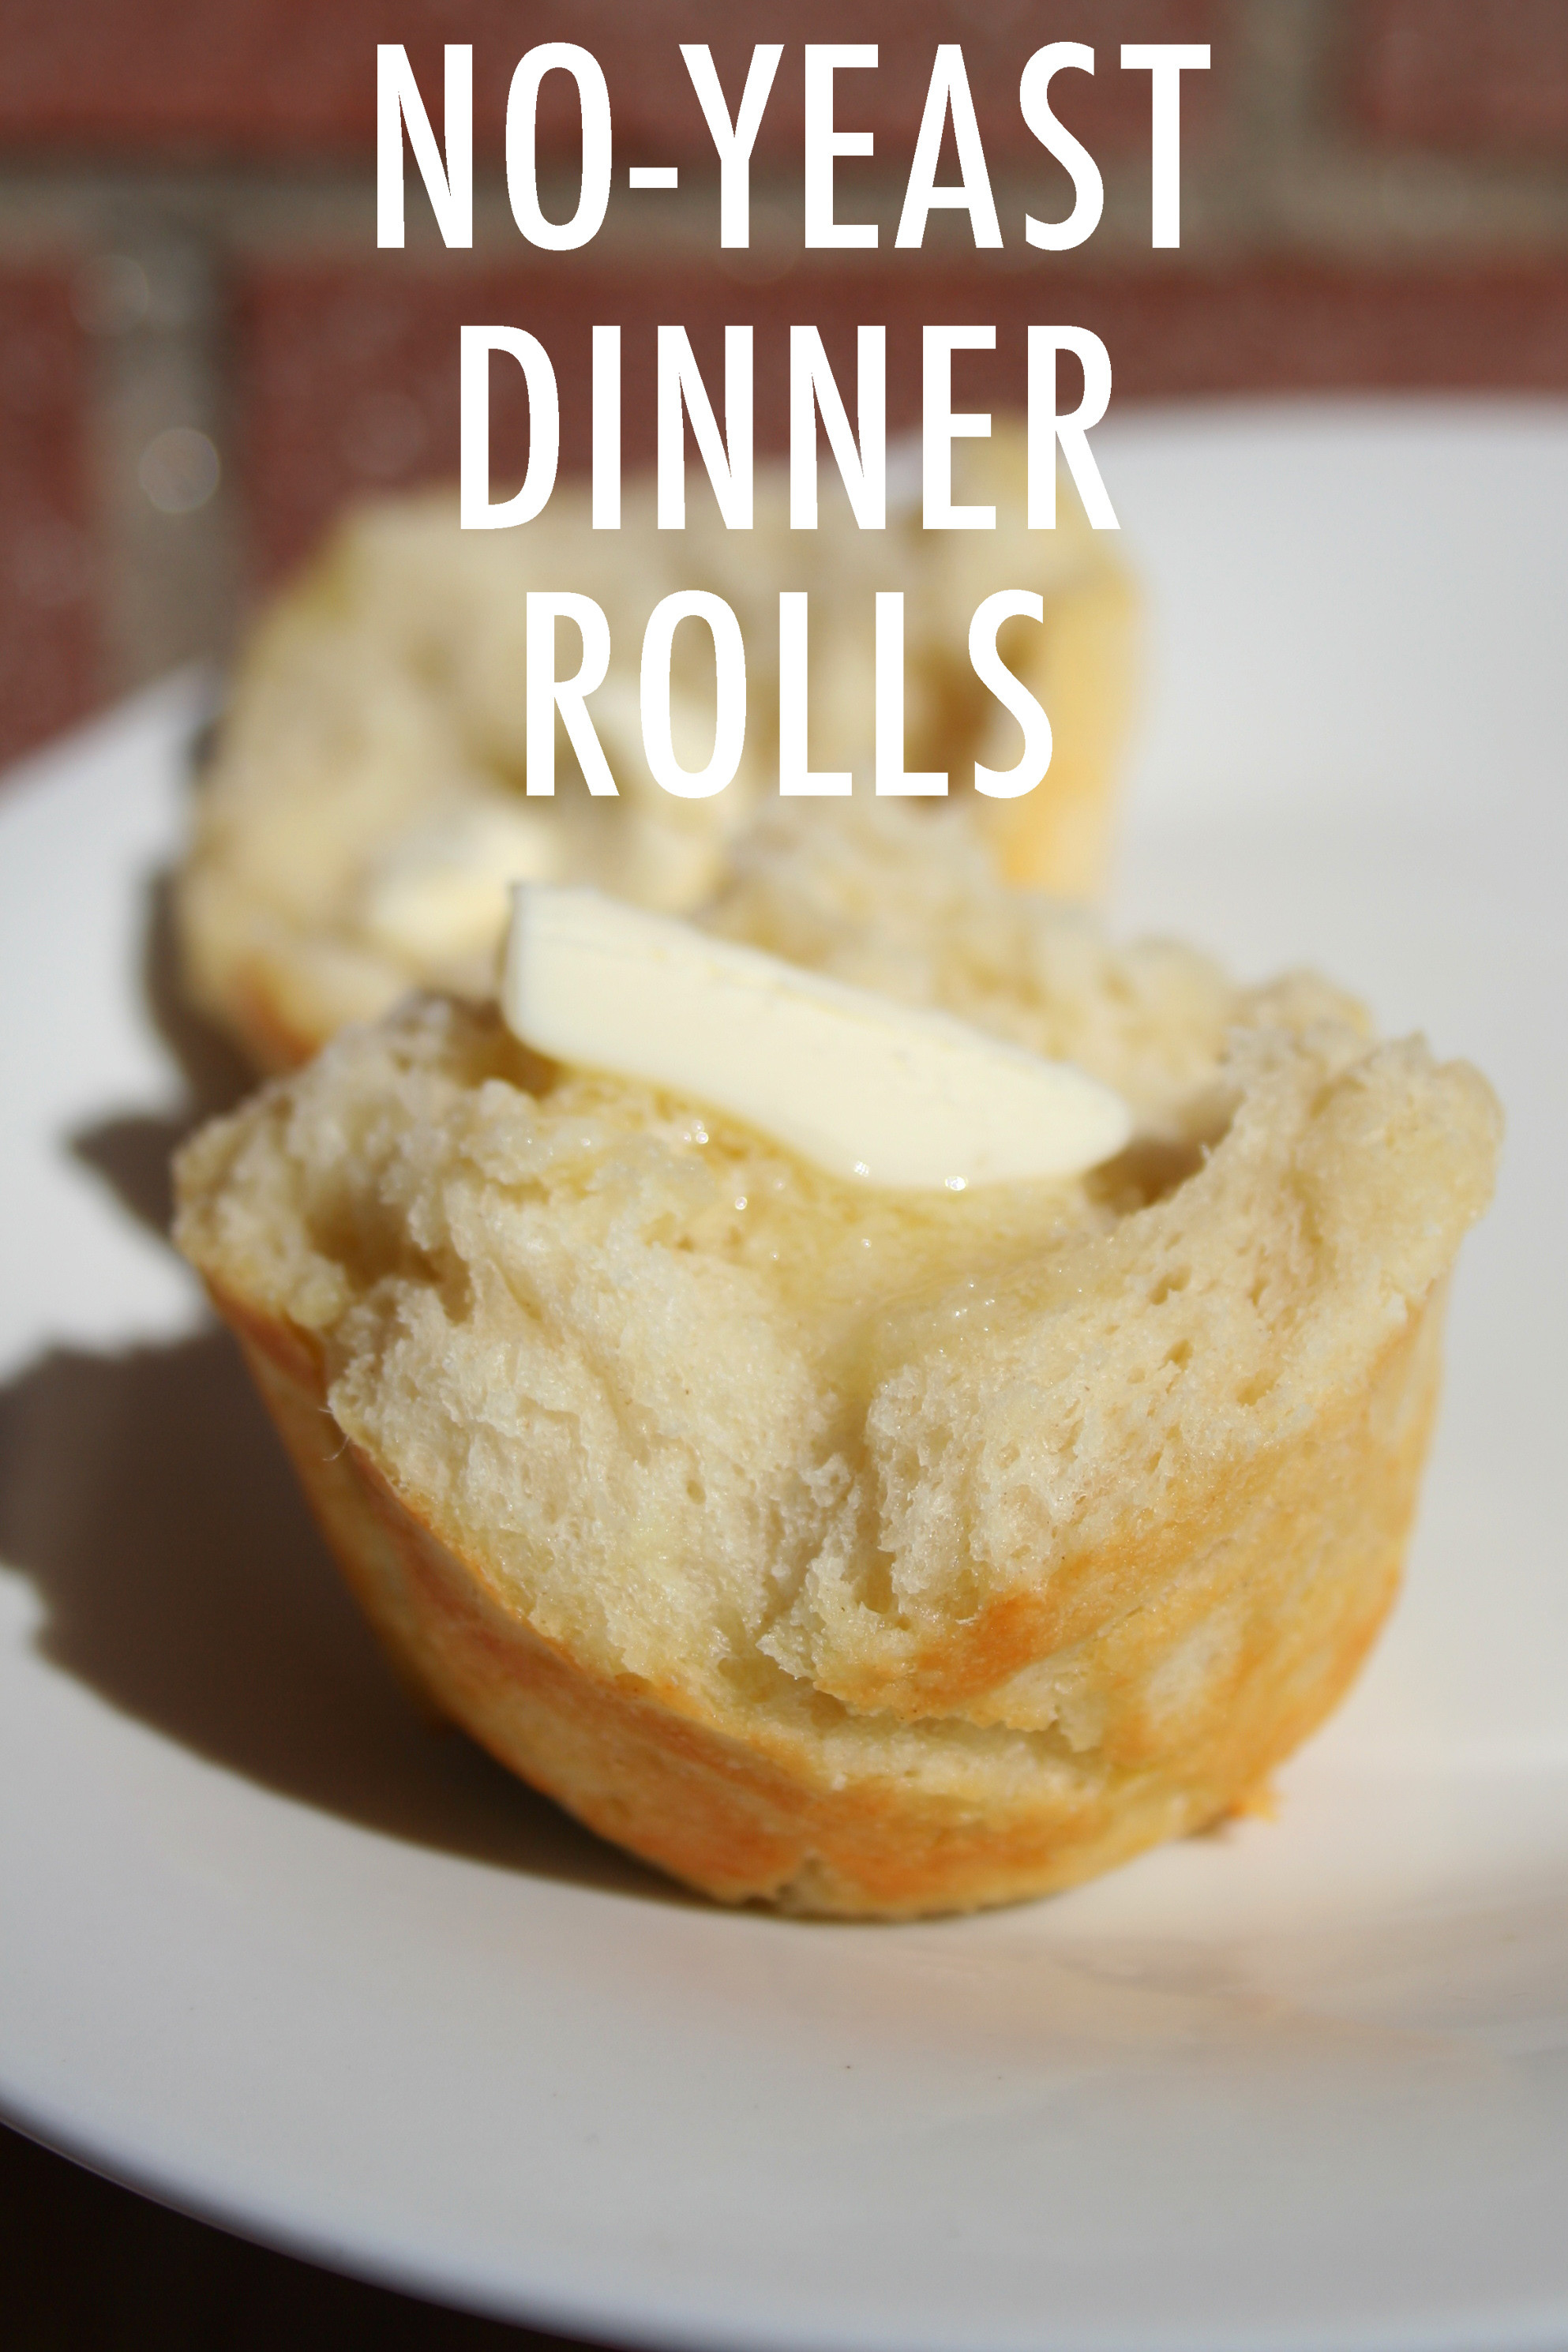 Easy Dinner Rolls No Yeast  No Yeast Dinner Rolls Easy 5 Ingre nt Rolls from Scratch